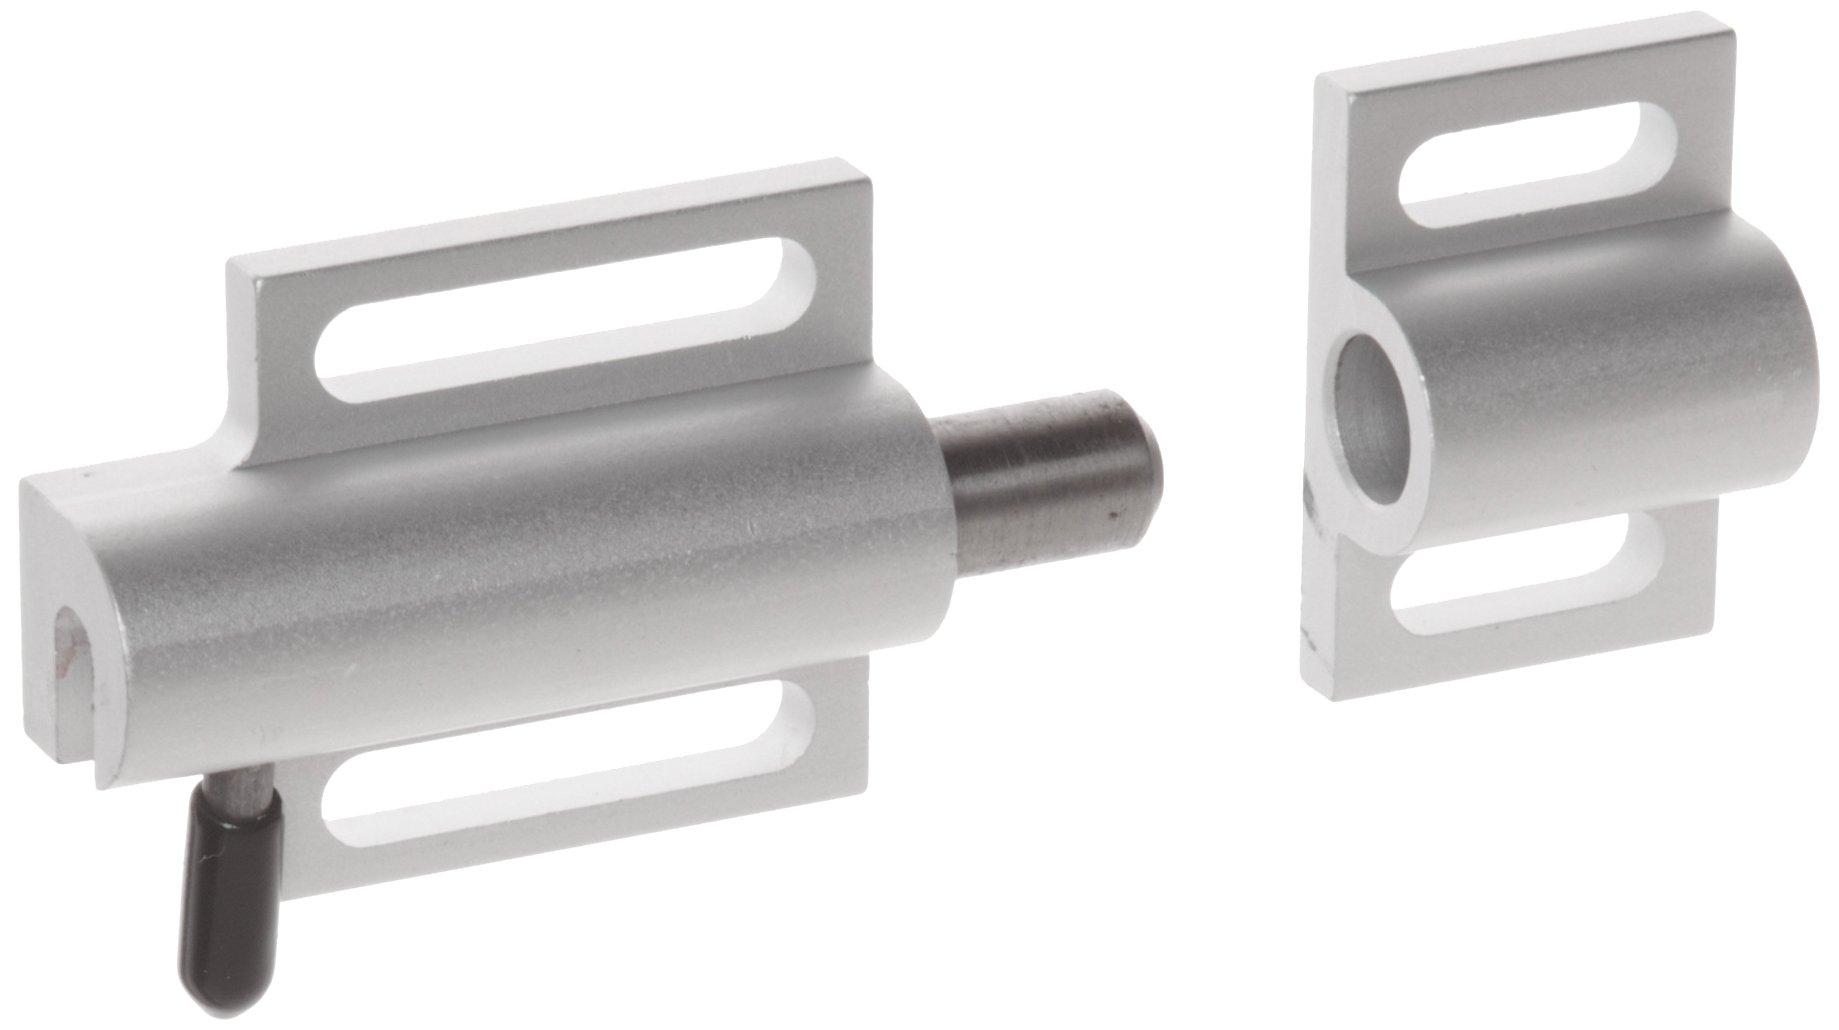 Faztek 15 Series Aluminum 6063-T6 Side Release Deadbolt Latch with Clear Anodize, 3'' Length x 1-1/2 Width